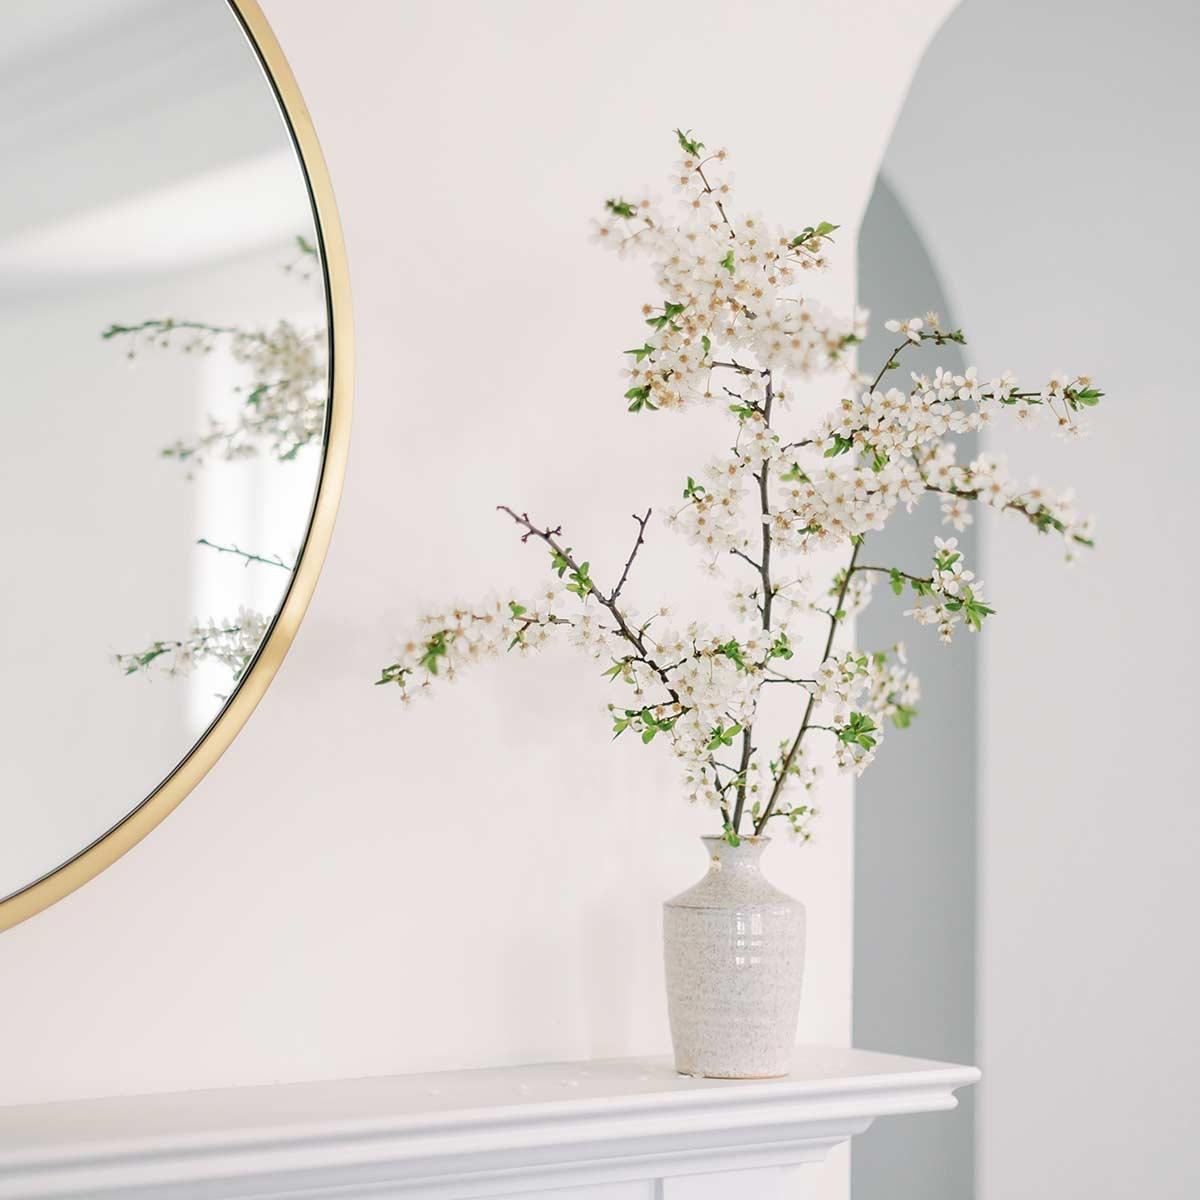 Spring flowering branch in white vase on clutter-free white mantel.